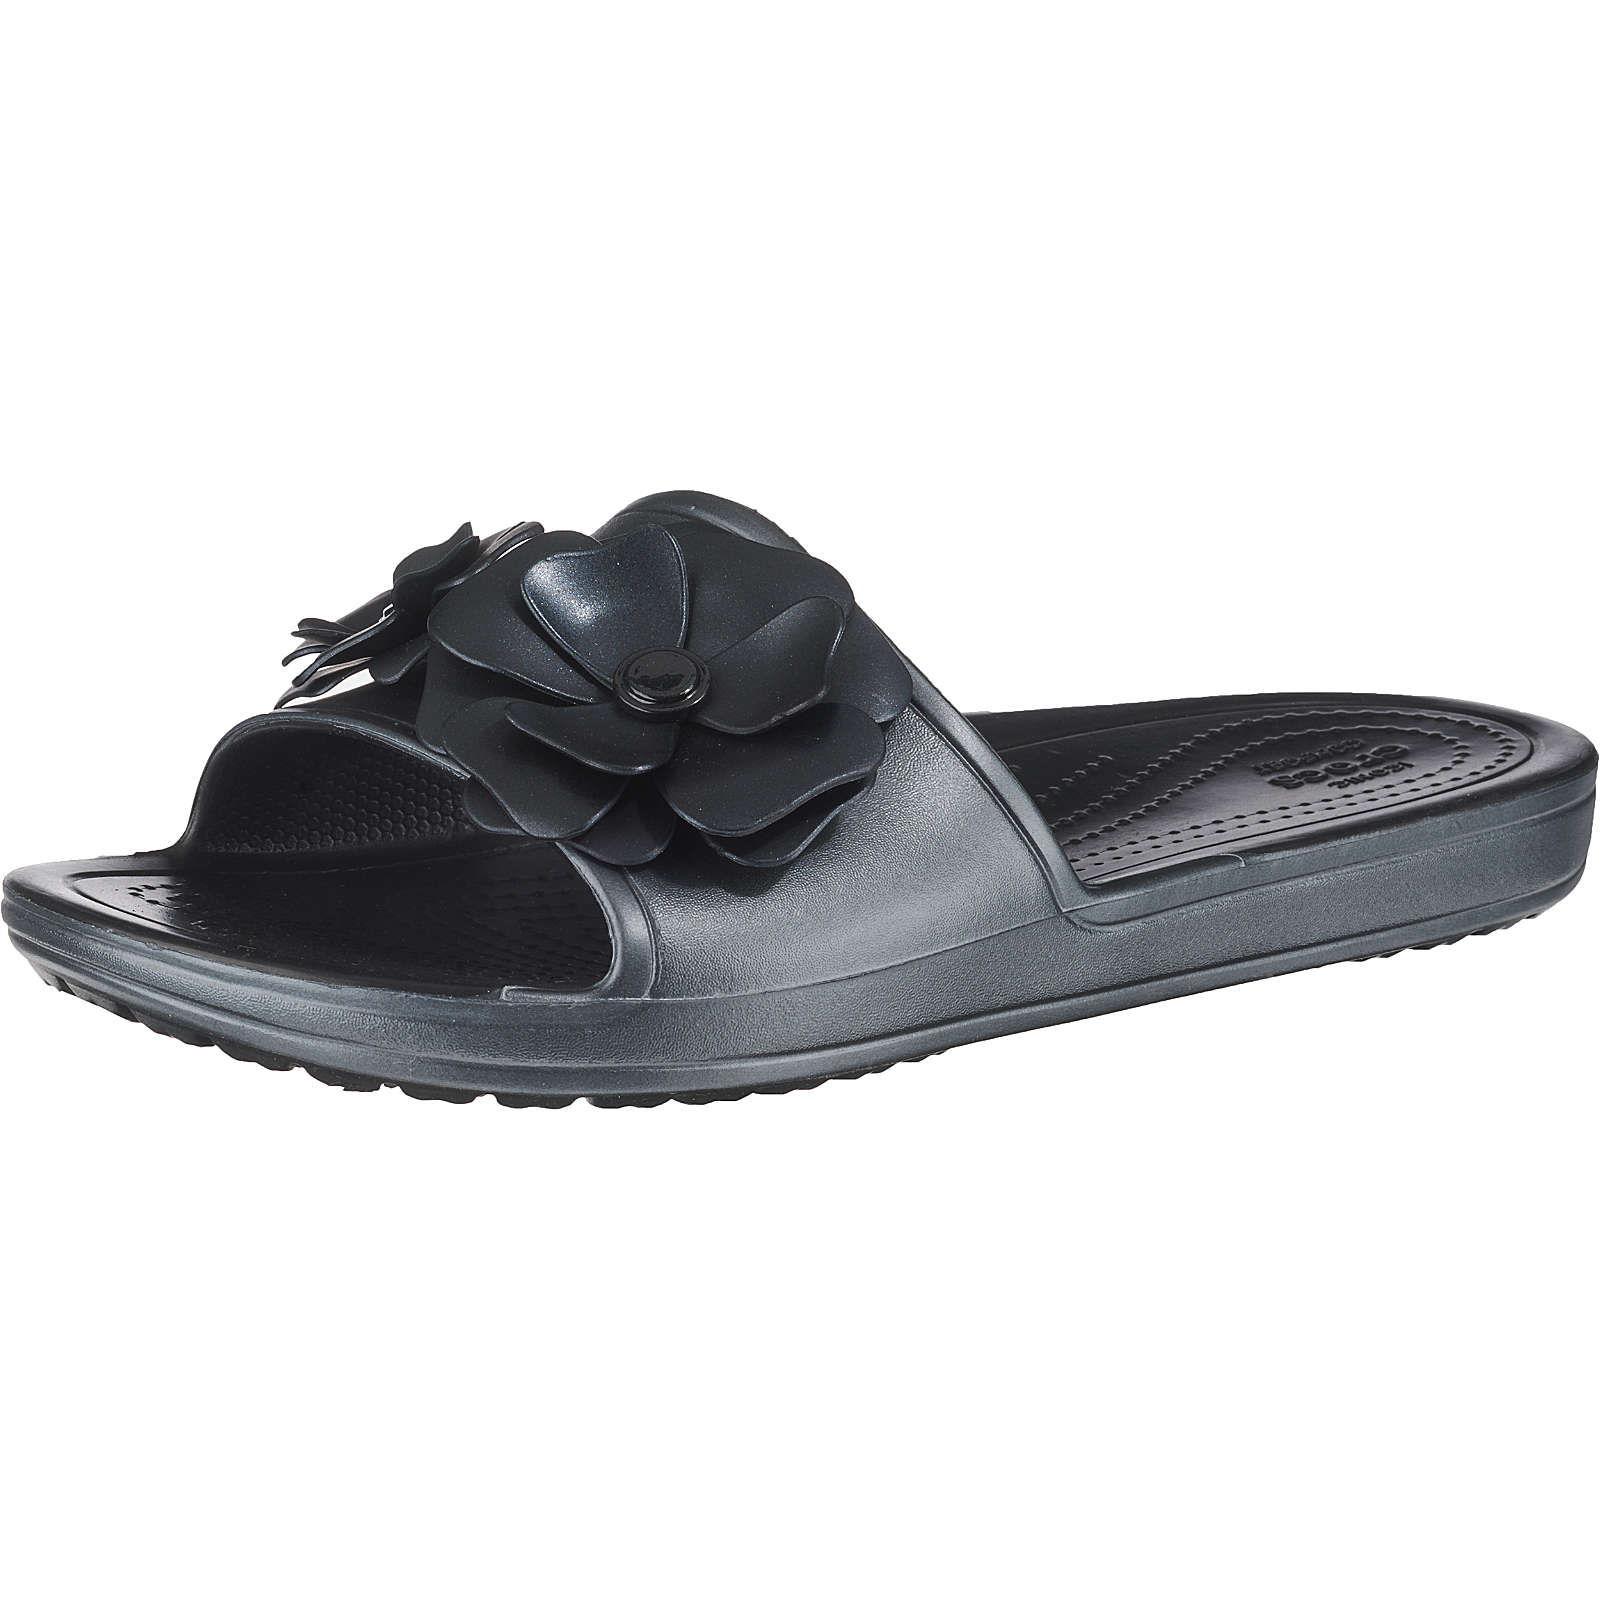 Crocs Sloane VividBlooms Sld W Blk/Blk Komfort-Pantoletten schwarz Damen Gr. 41/42